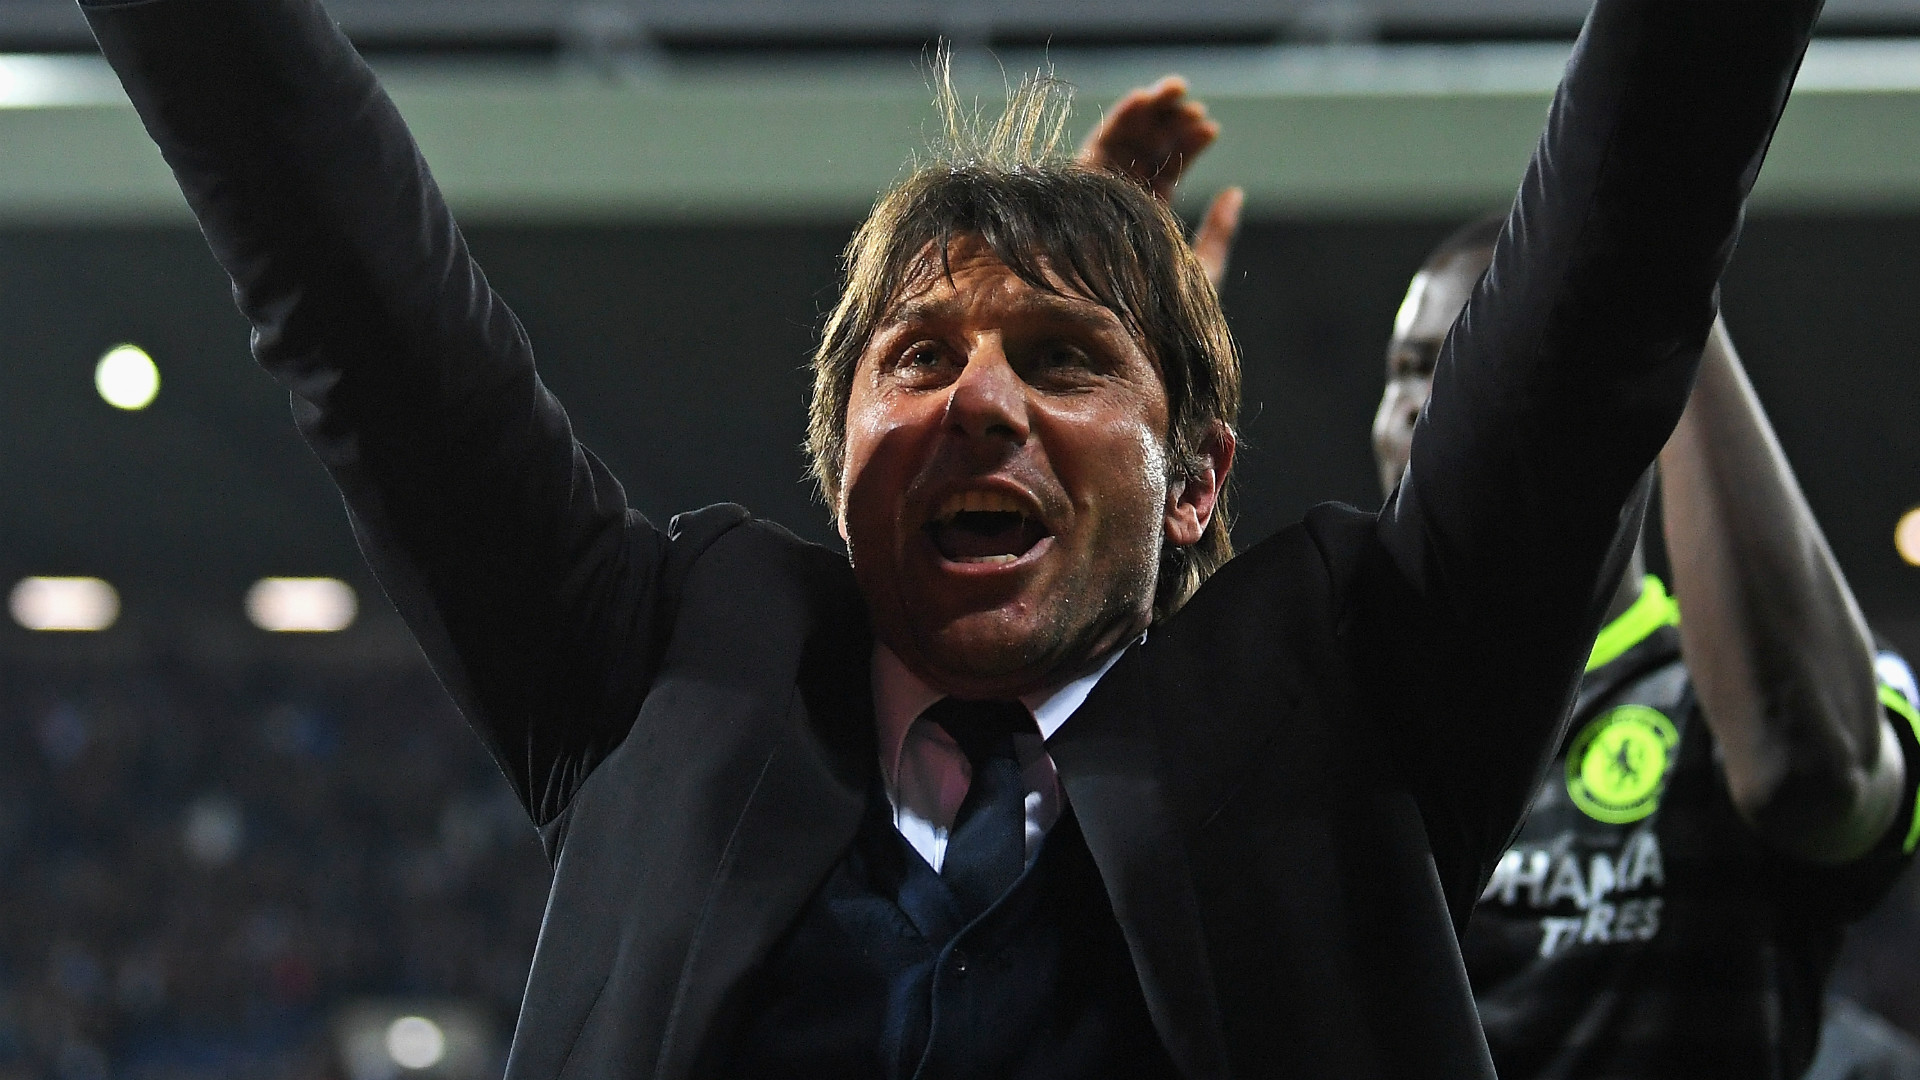 Stars get tidy bonus for winning Premier League